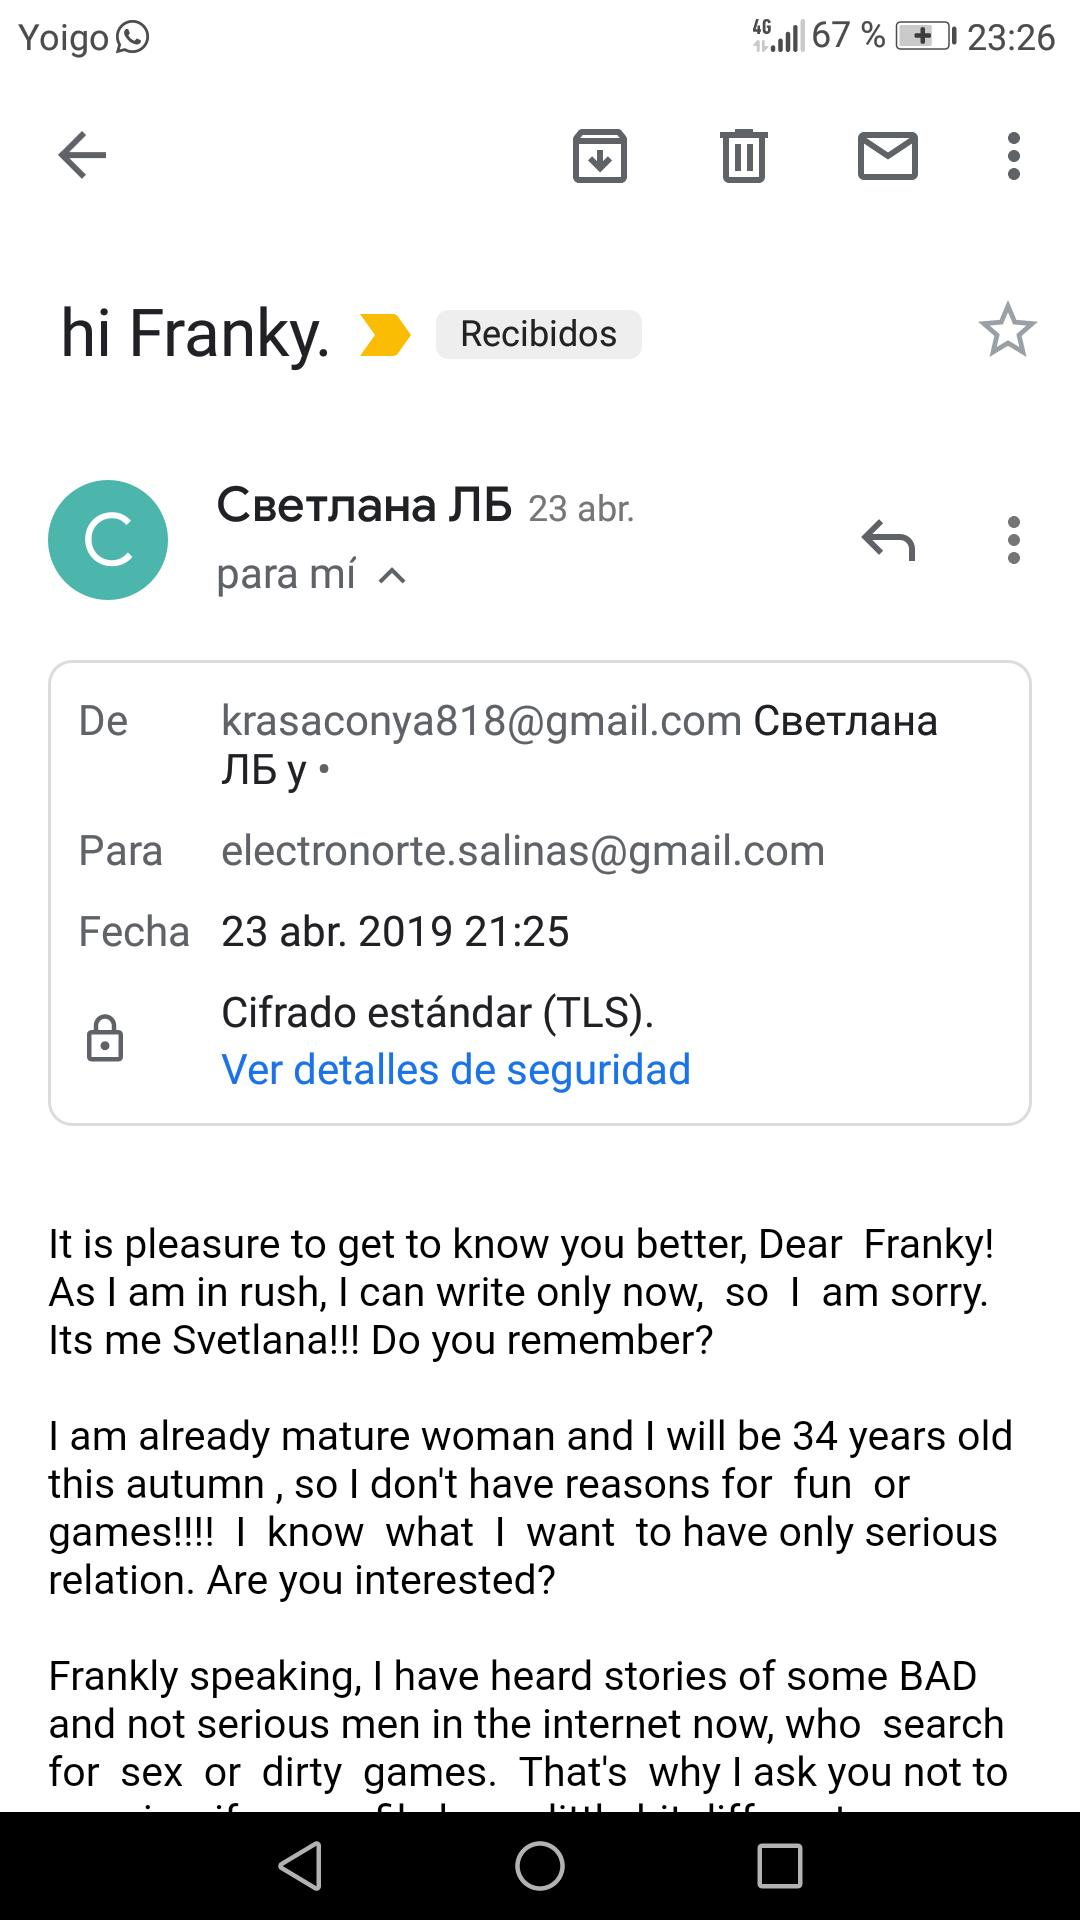 Screenshot_20190526-232622.png